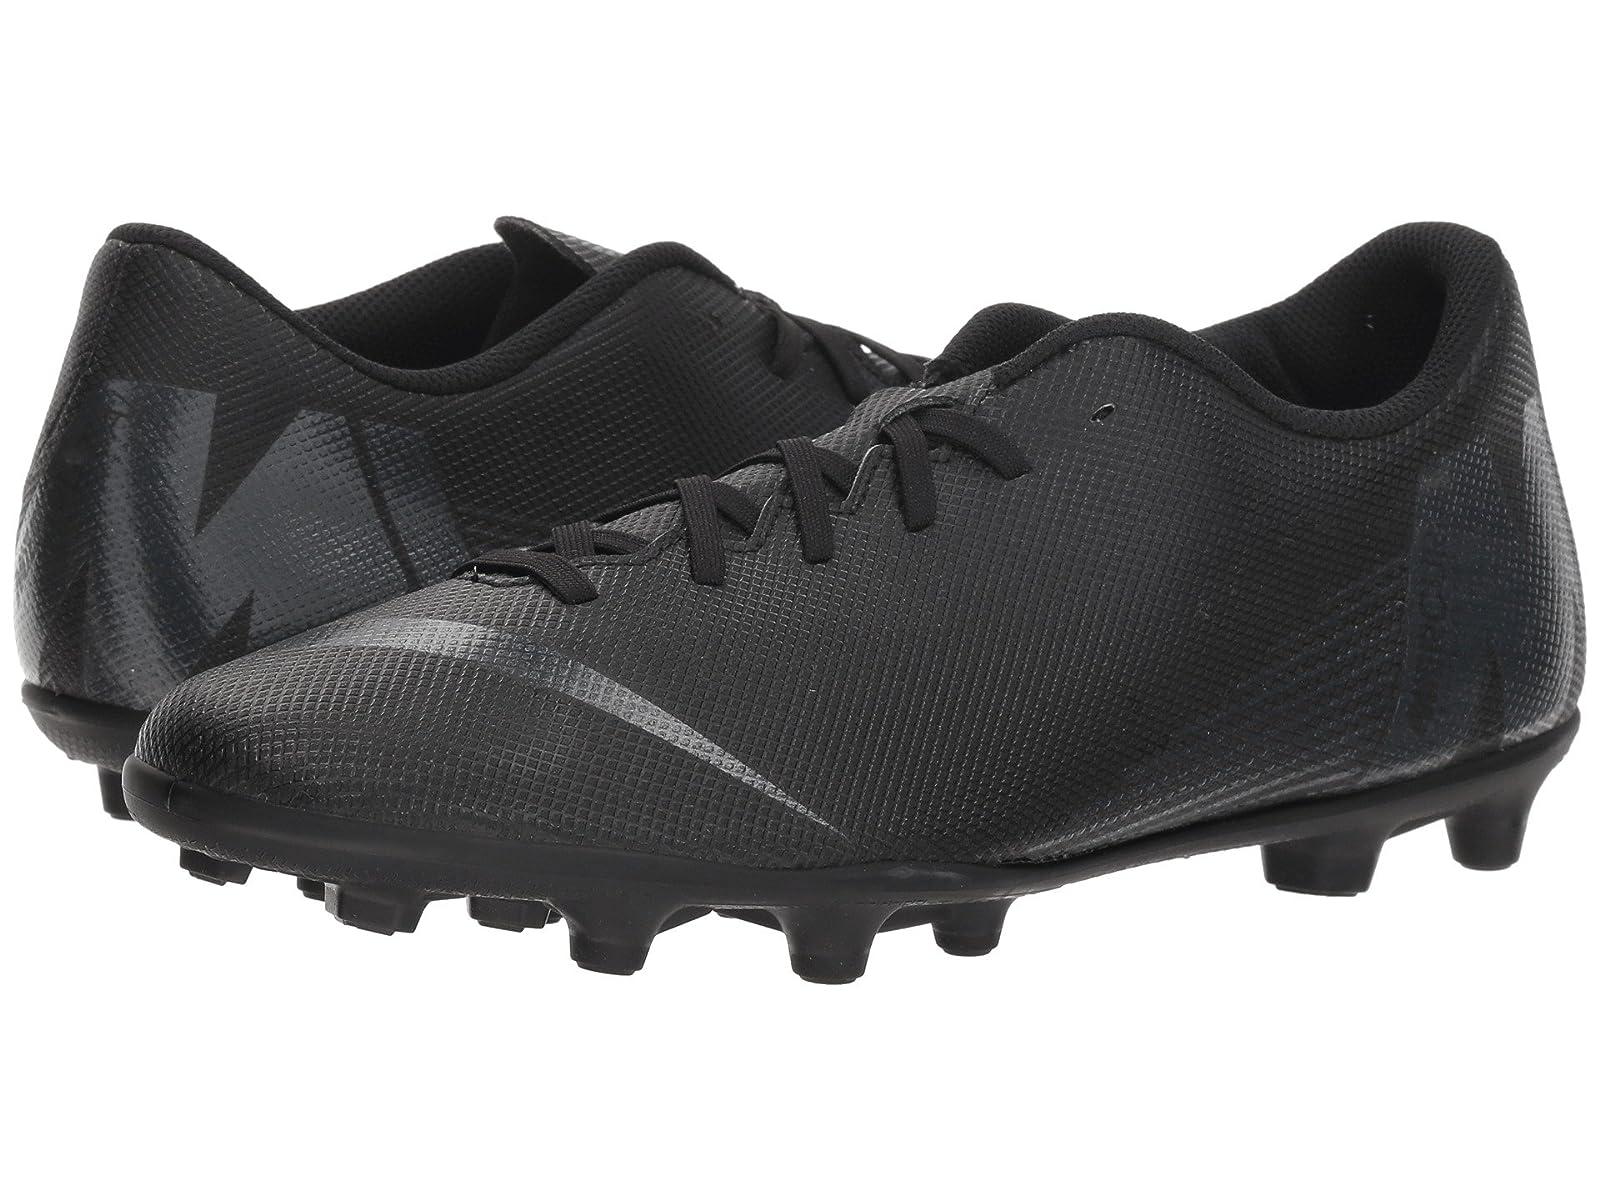 Nike Vapor 12 12 Vapor Club MG-Quality First-Men/Women 9ee6a5